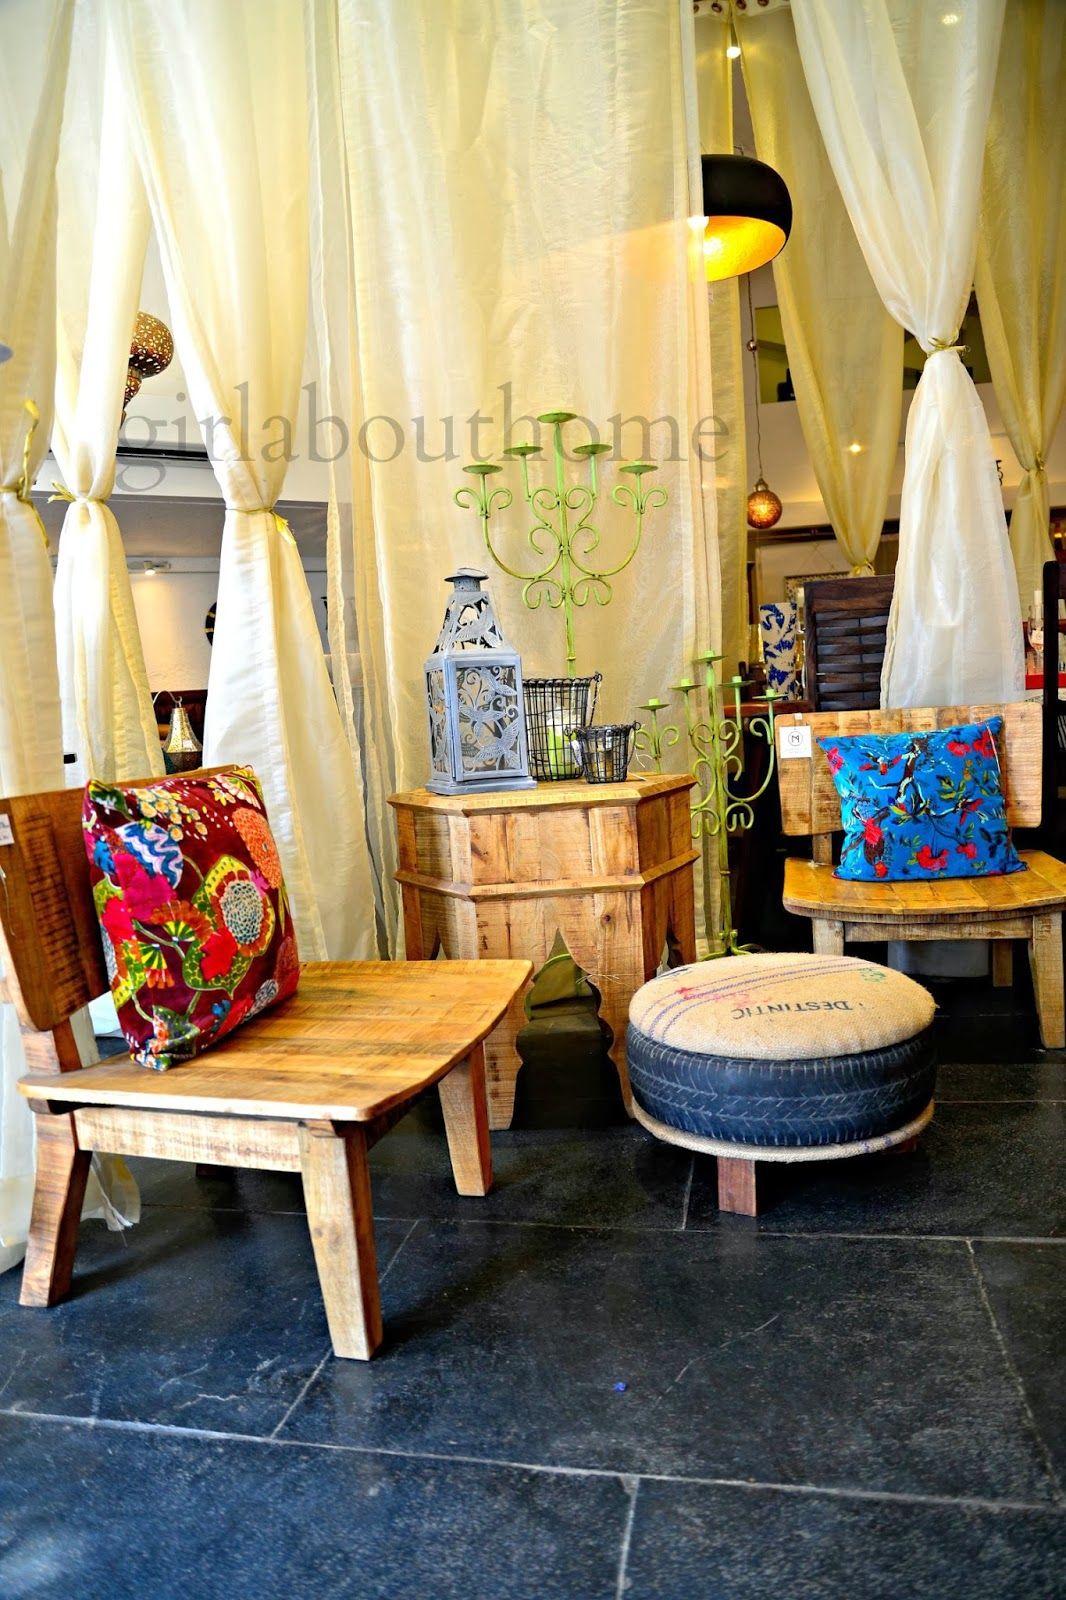 Magnolia store indian home decor homes house colors furniture also design ideas pinterest rh